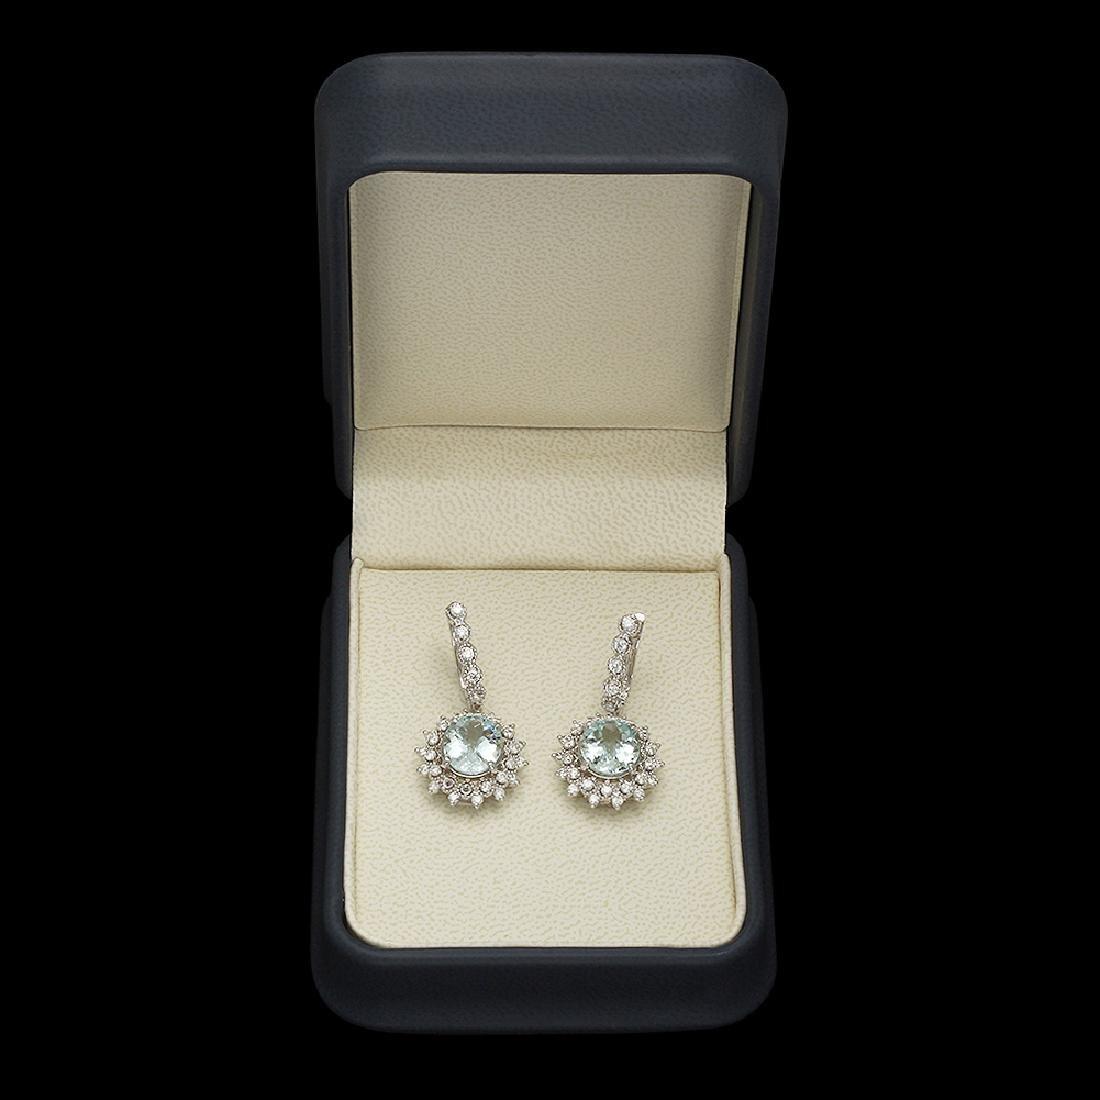 14K Gold 6.28ct Aquamarine 1.60ct Diamond Earrings - 3